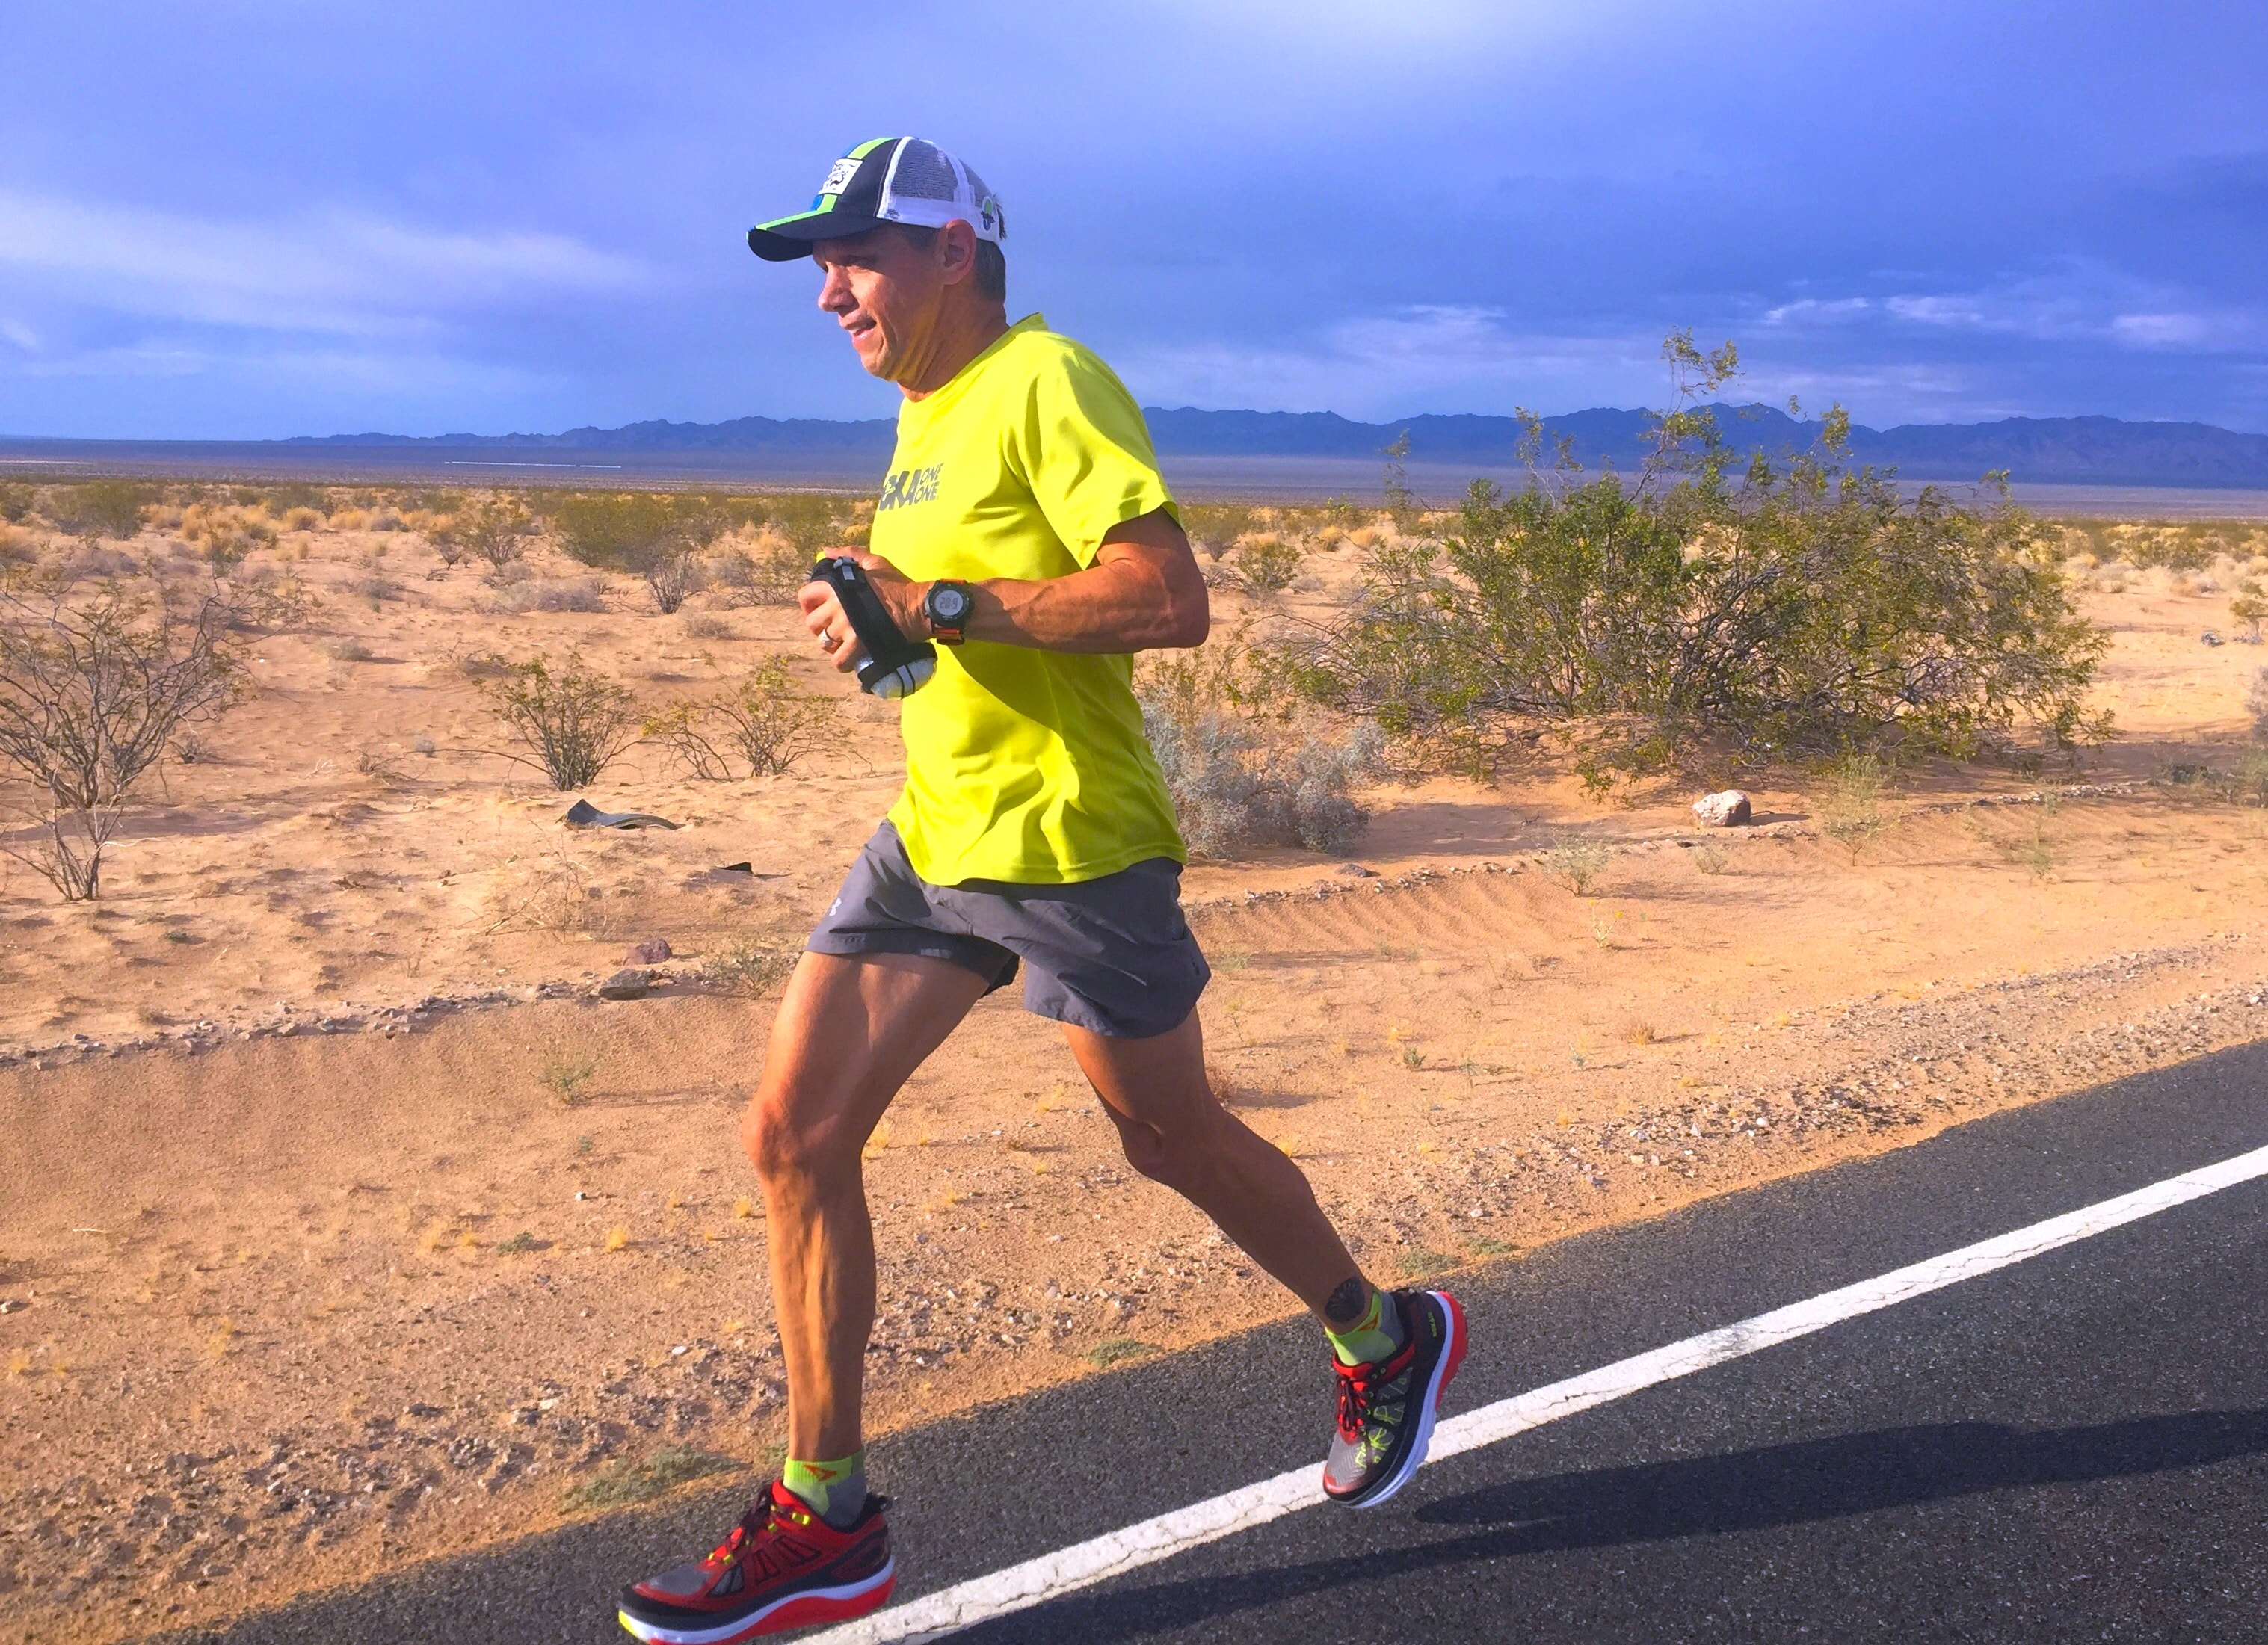 Charlie Engle, Ultra-Endurance Athlete To Join Zeigler Universigty Speaker Series